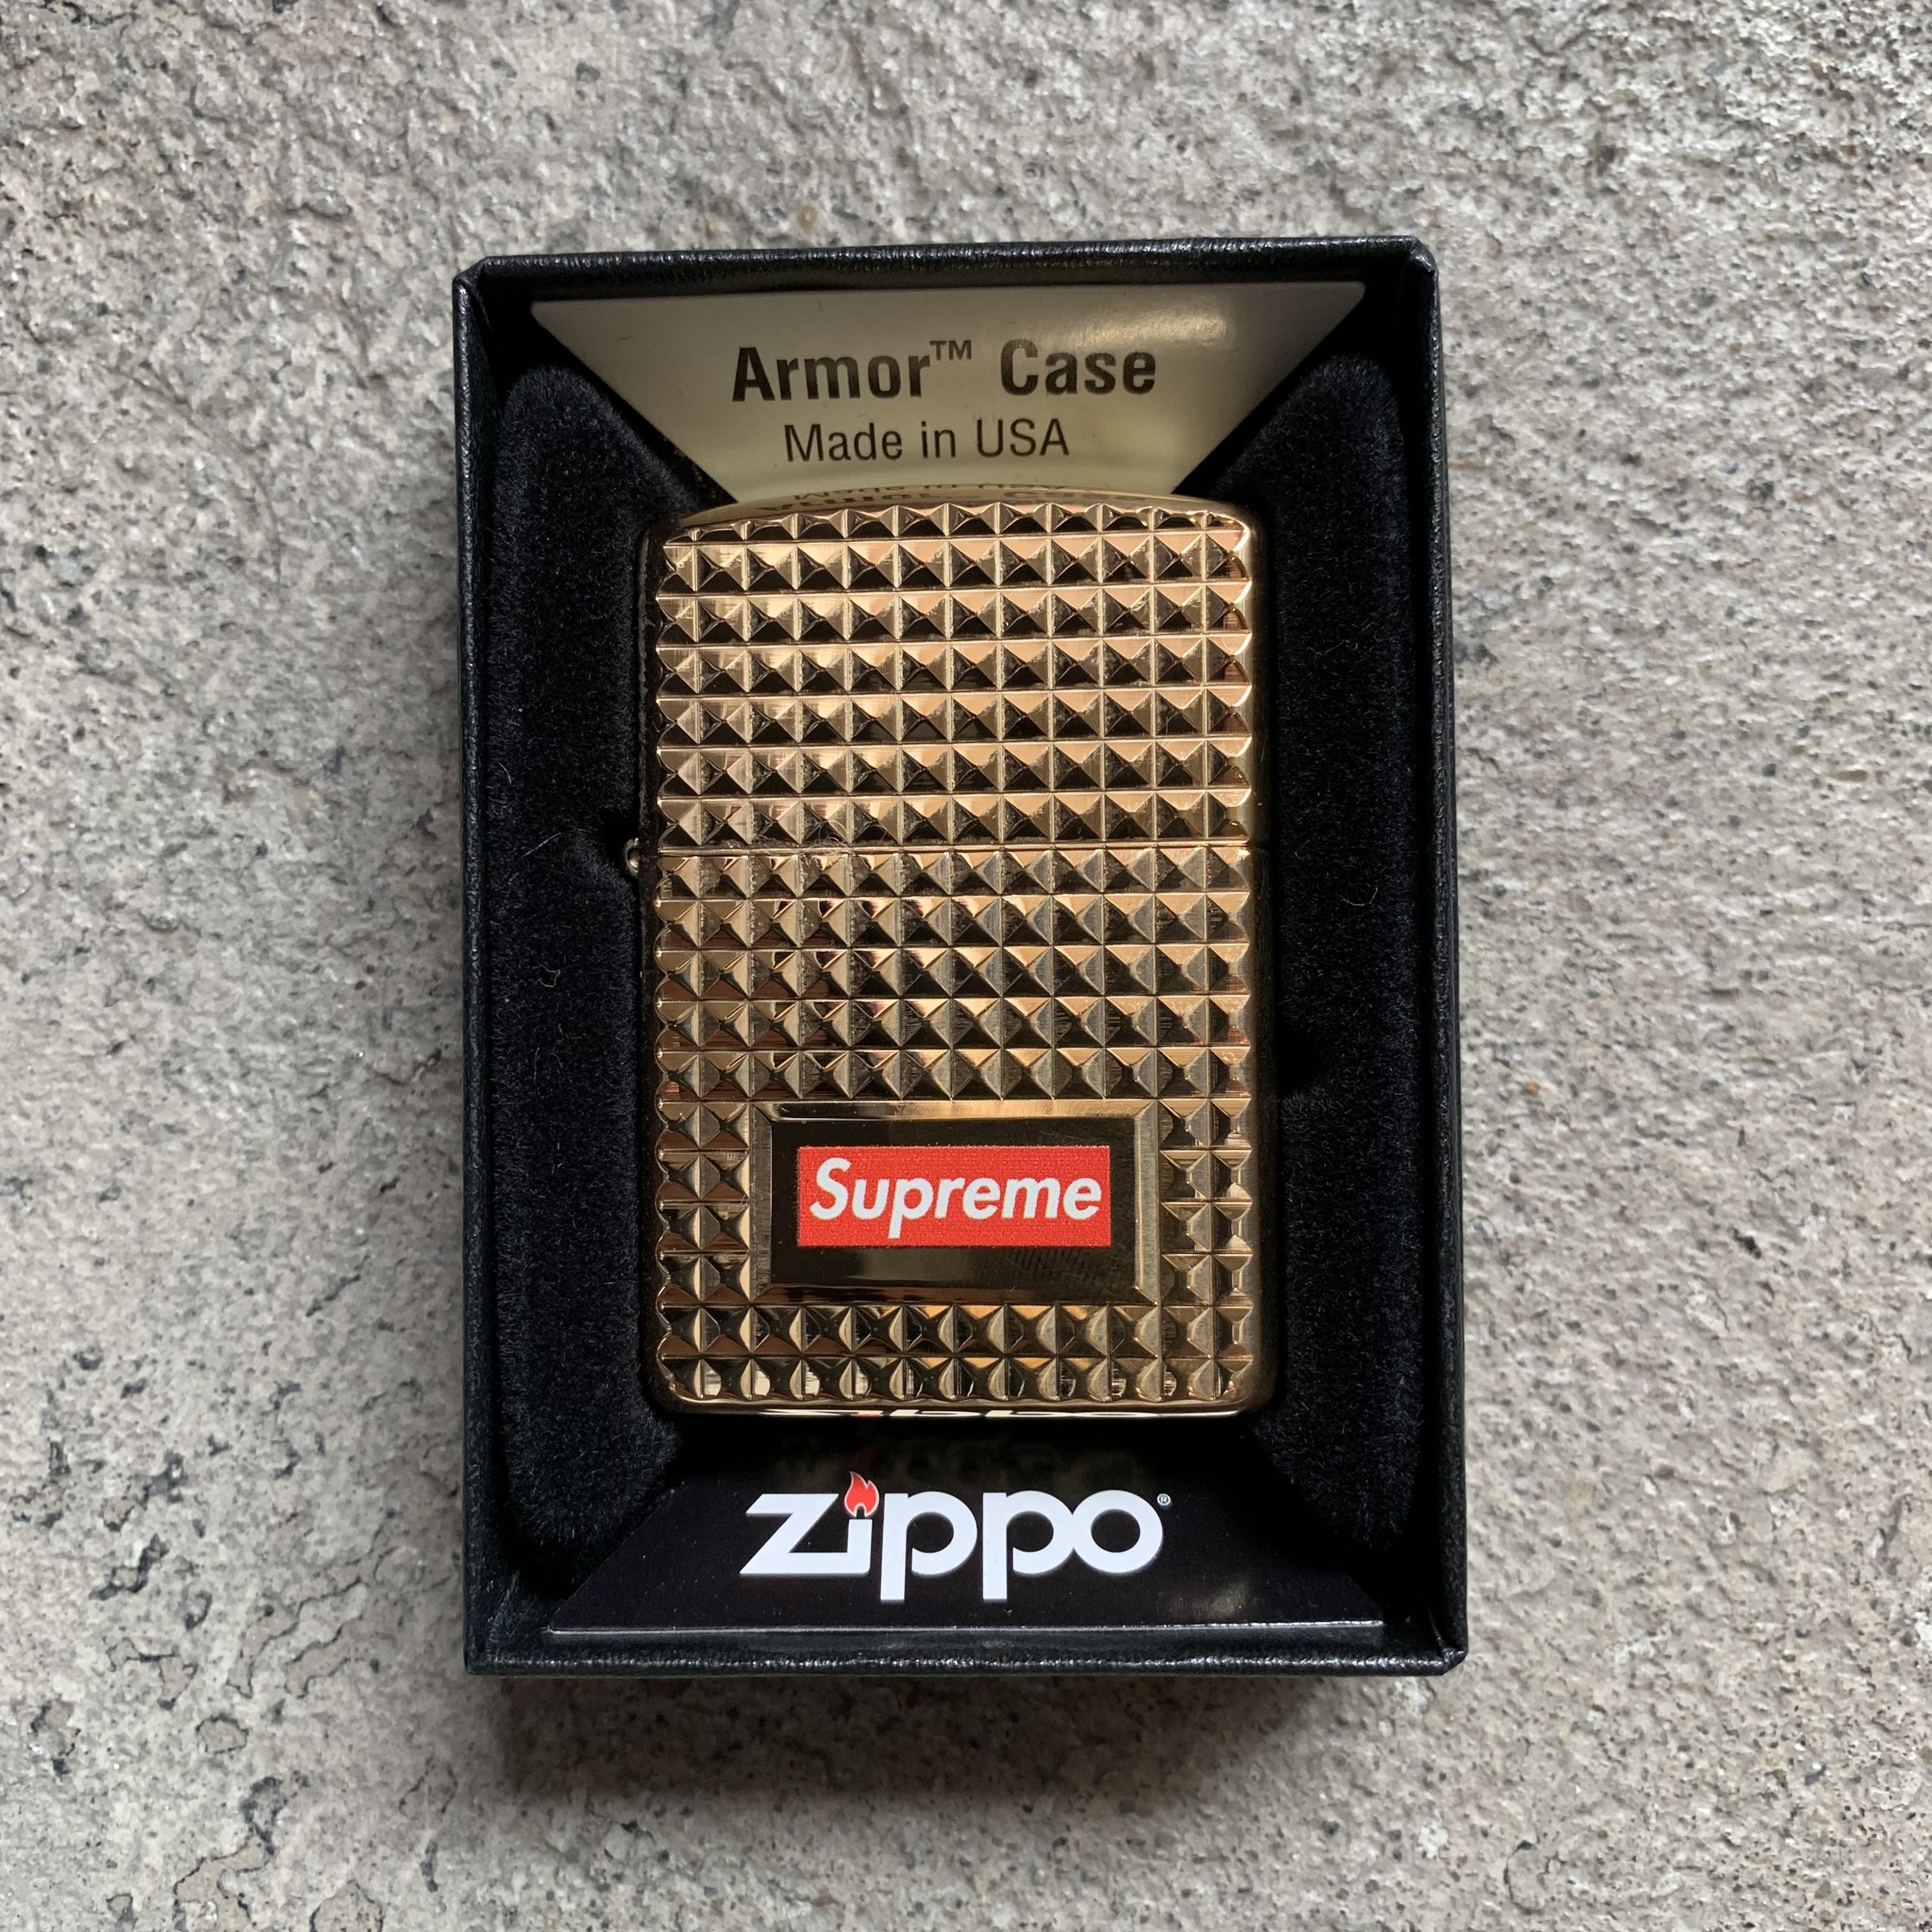 Supreme Diamond Cut Zippo